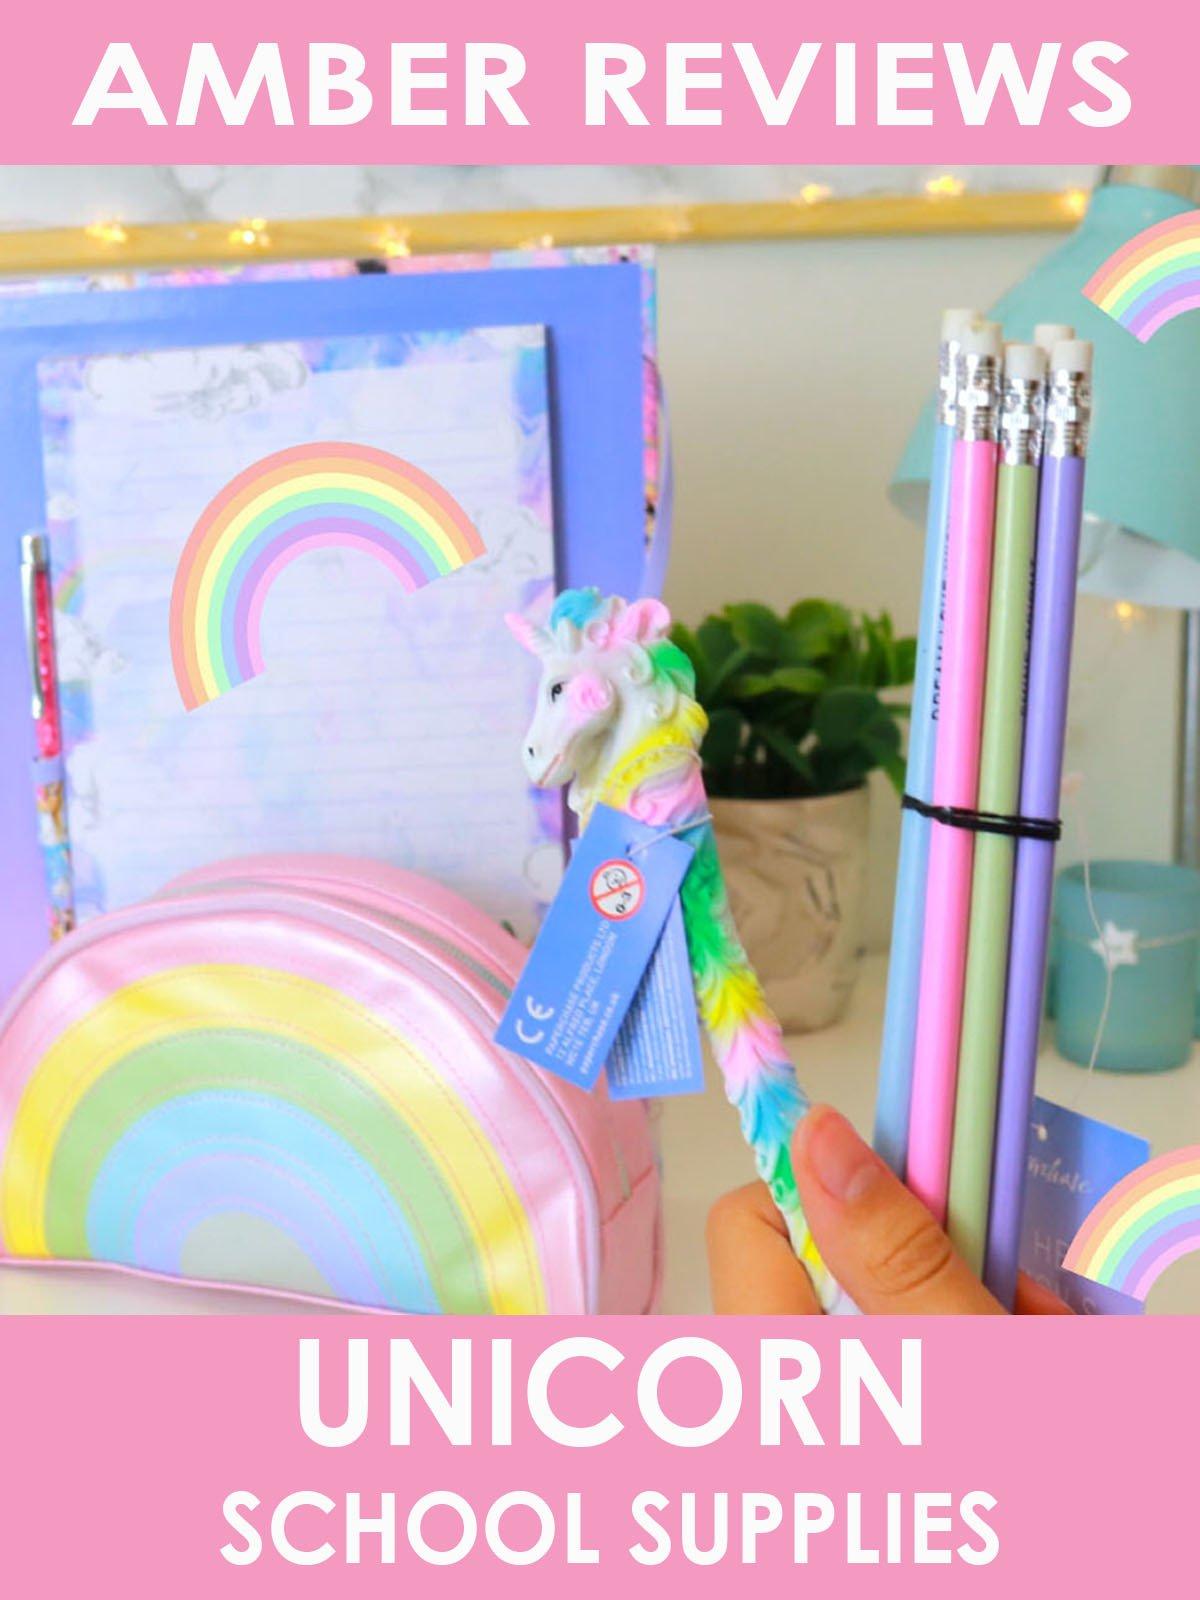 Amber Reviews Unicorn School Supplies